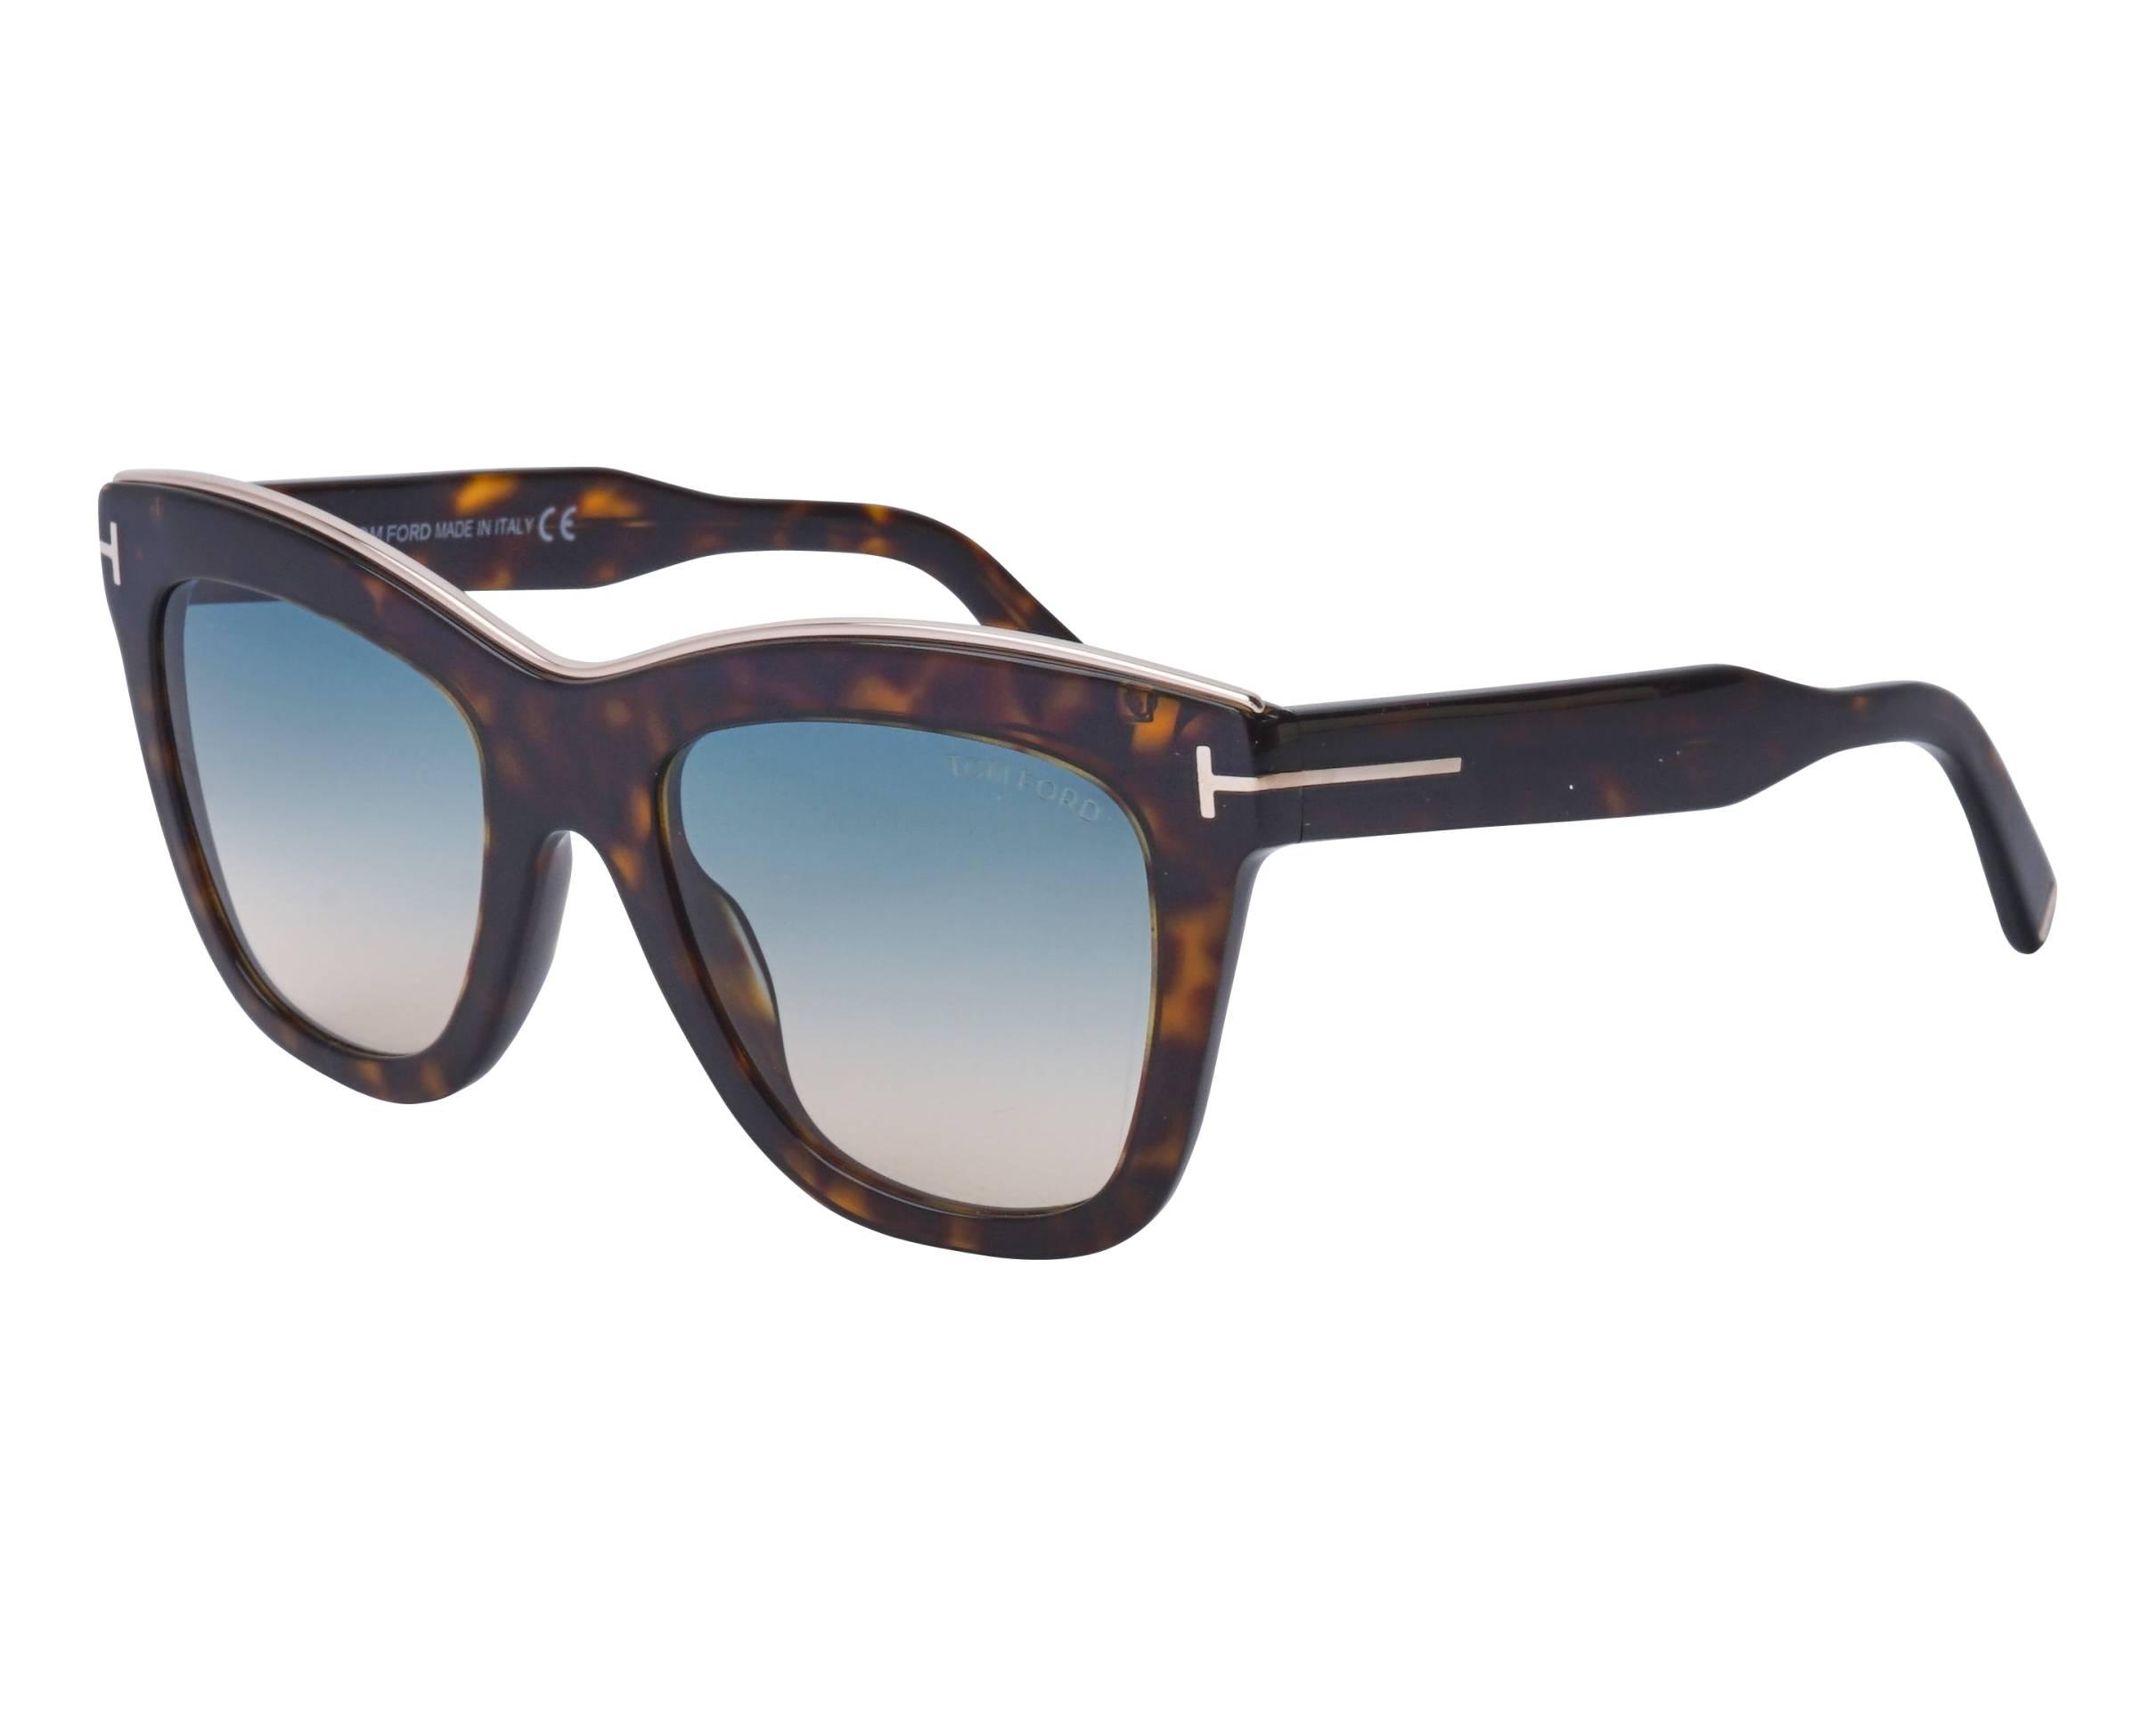 Sunglasses Tom Ford Julie Tf 685 52p